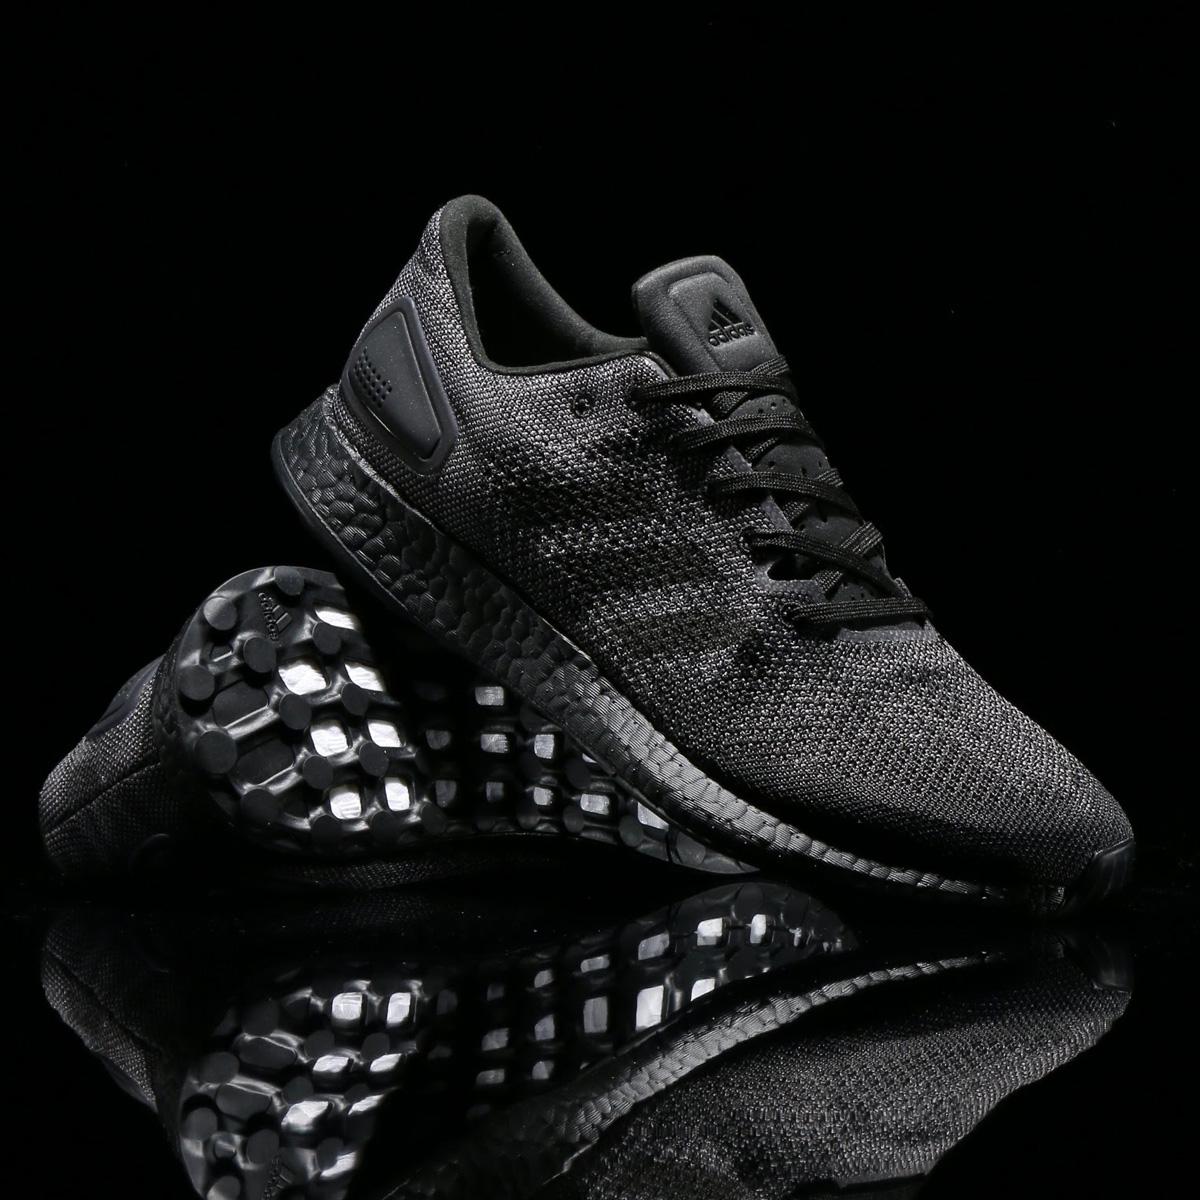 adidas Originals PureBOOST DPR LTD (アディダス オリジナルス ピュアブースト DPR LTD)Core Black/Core Black/Carbon【メンズ レディース スニーカー】18SS-I